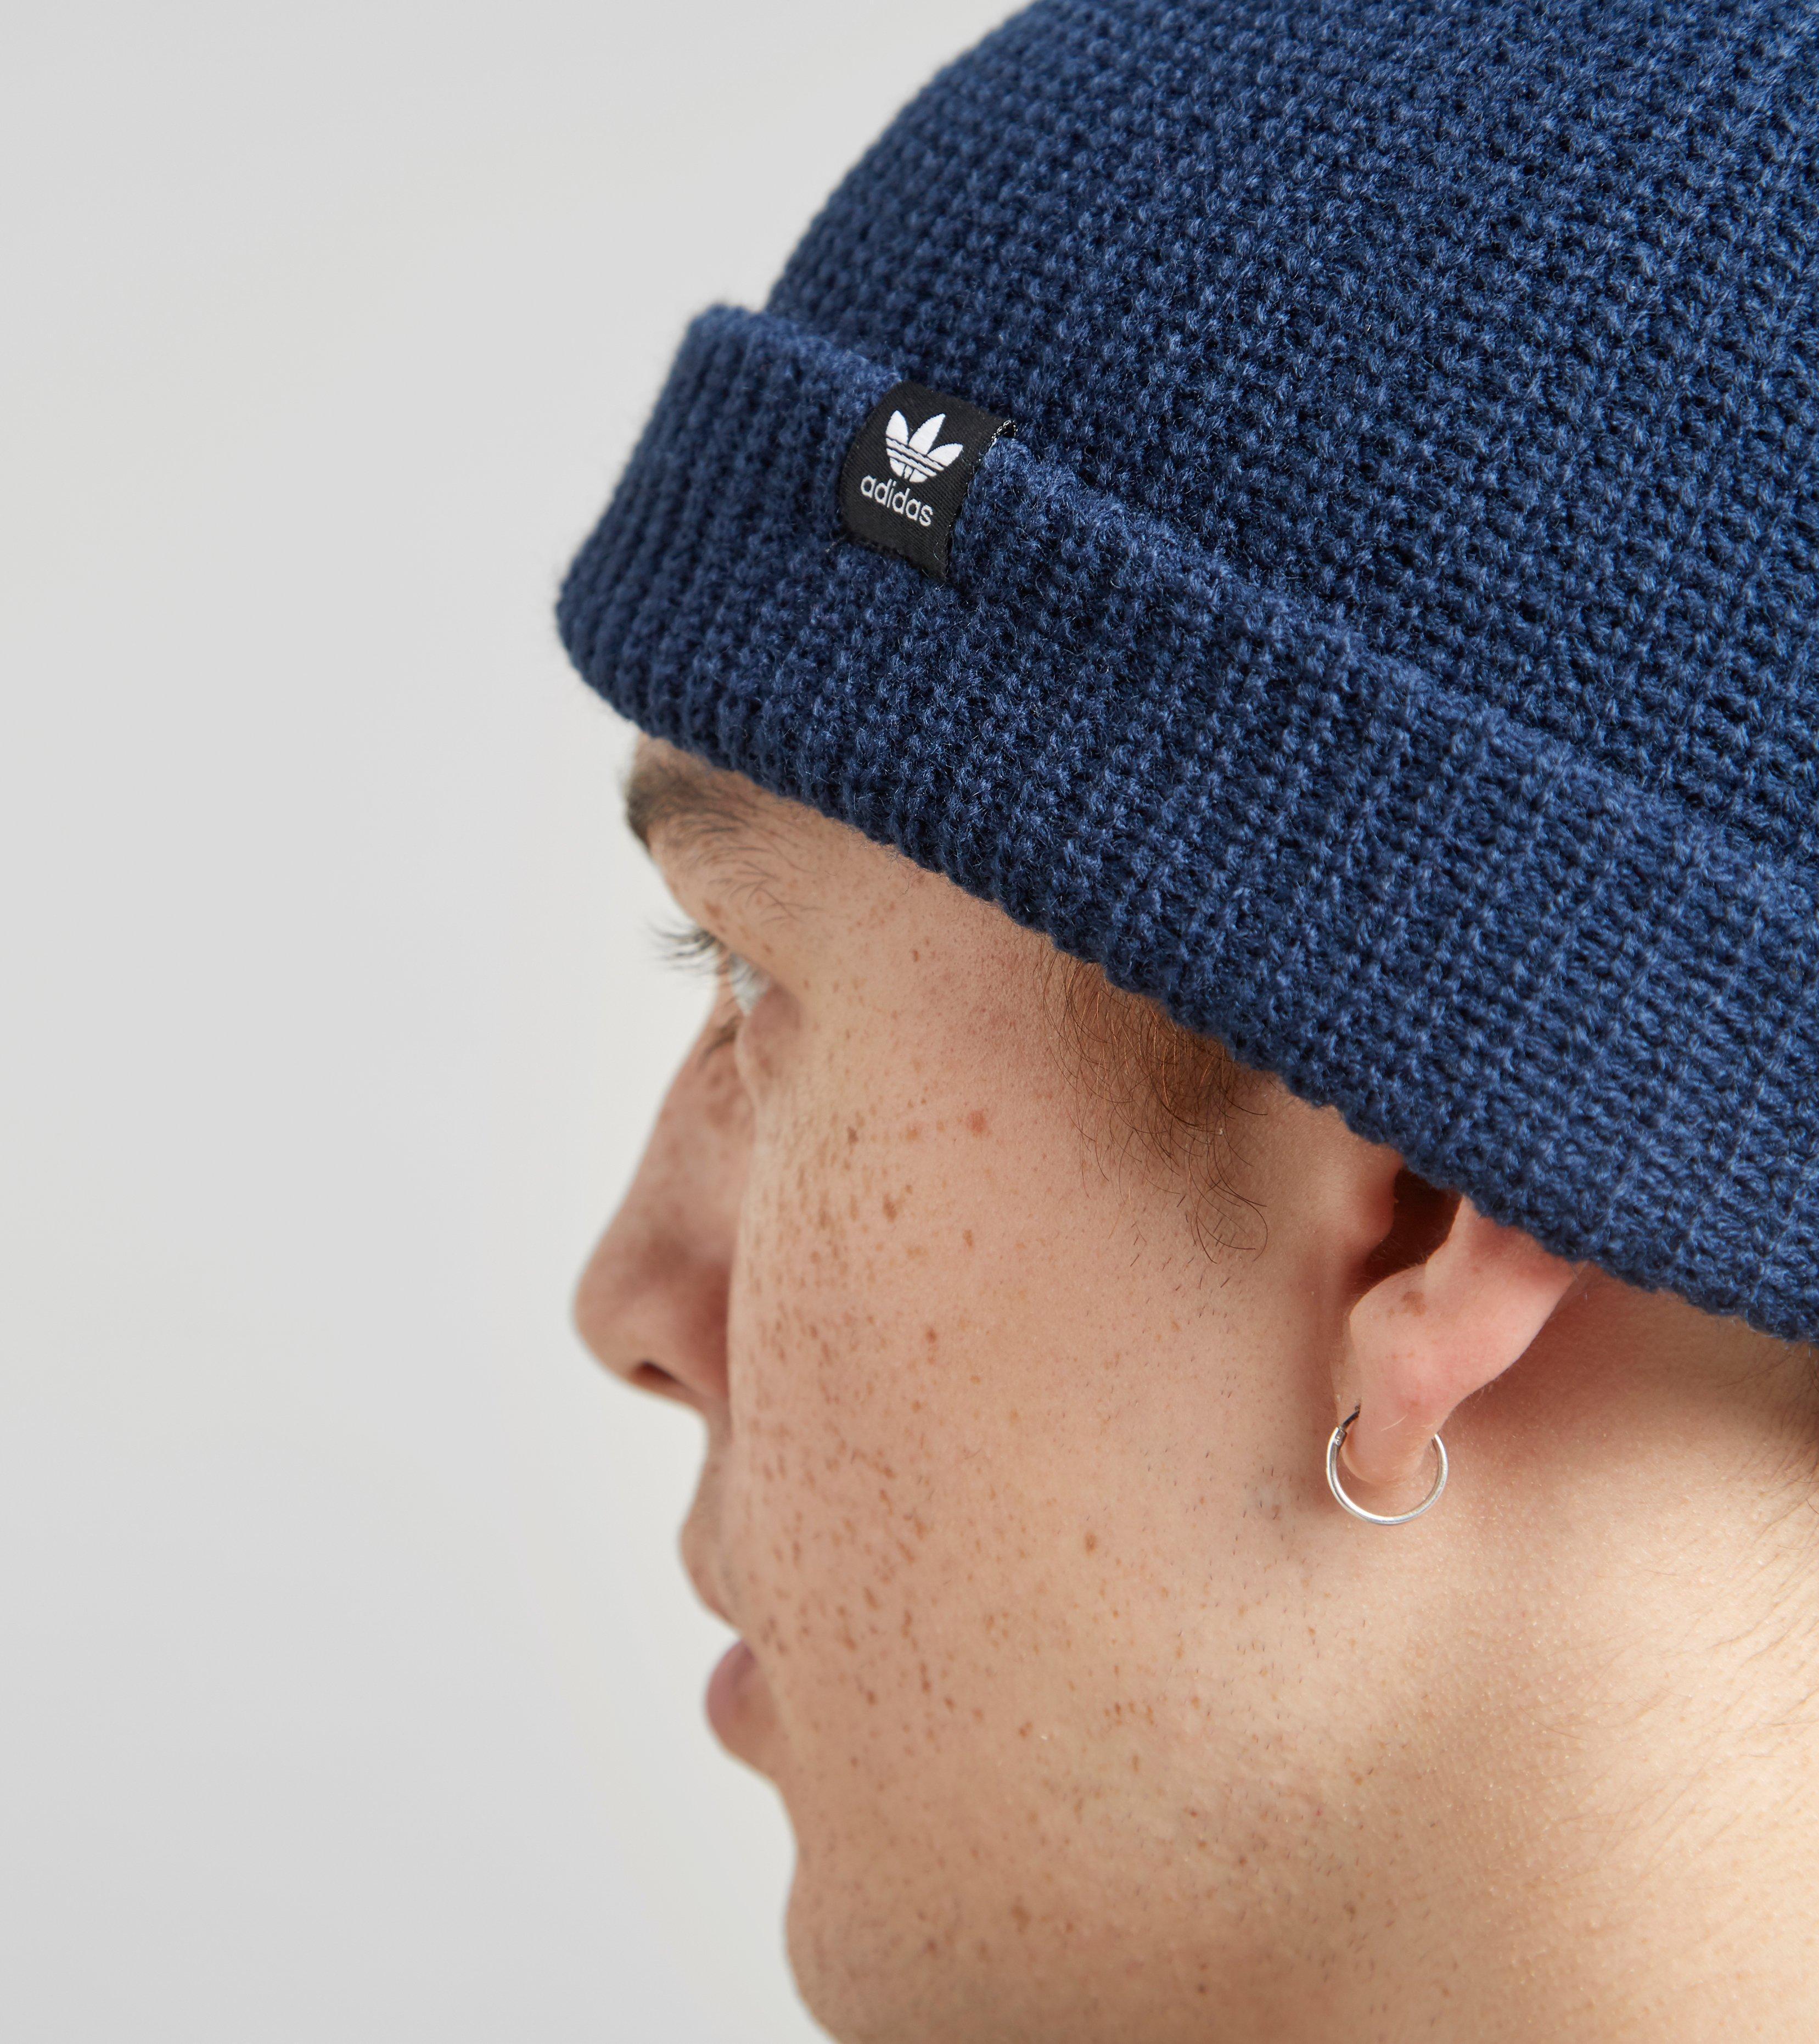 008c76fbf5525 adidas Originals Trefoil Fisherman Beanie in Blue for Men - Lyst